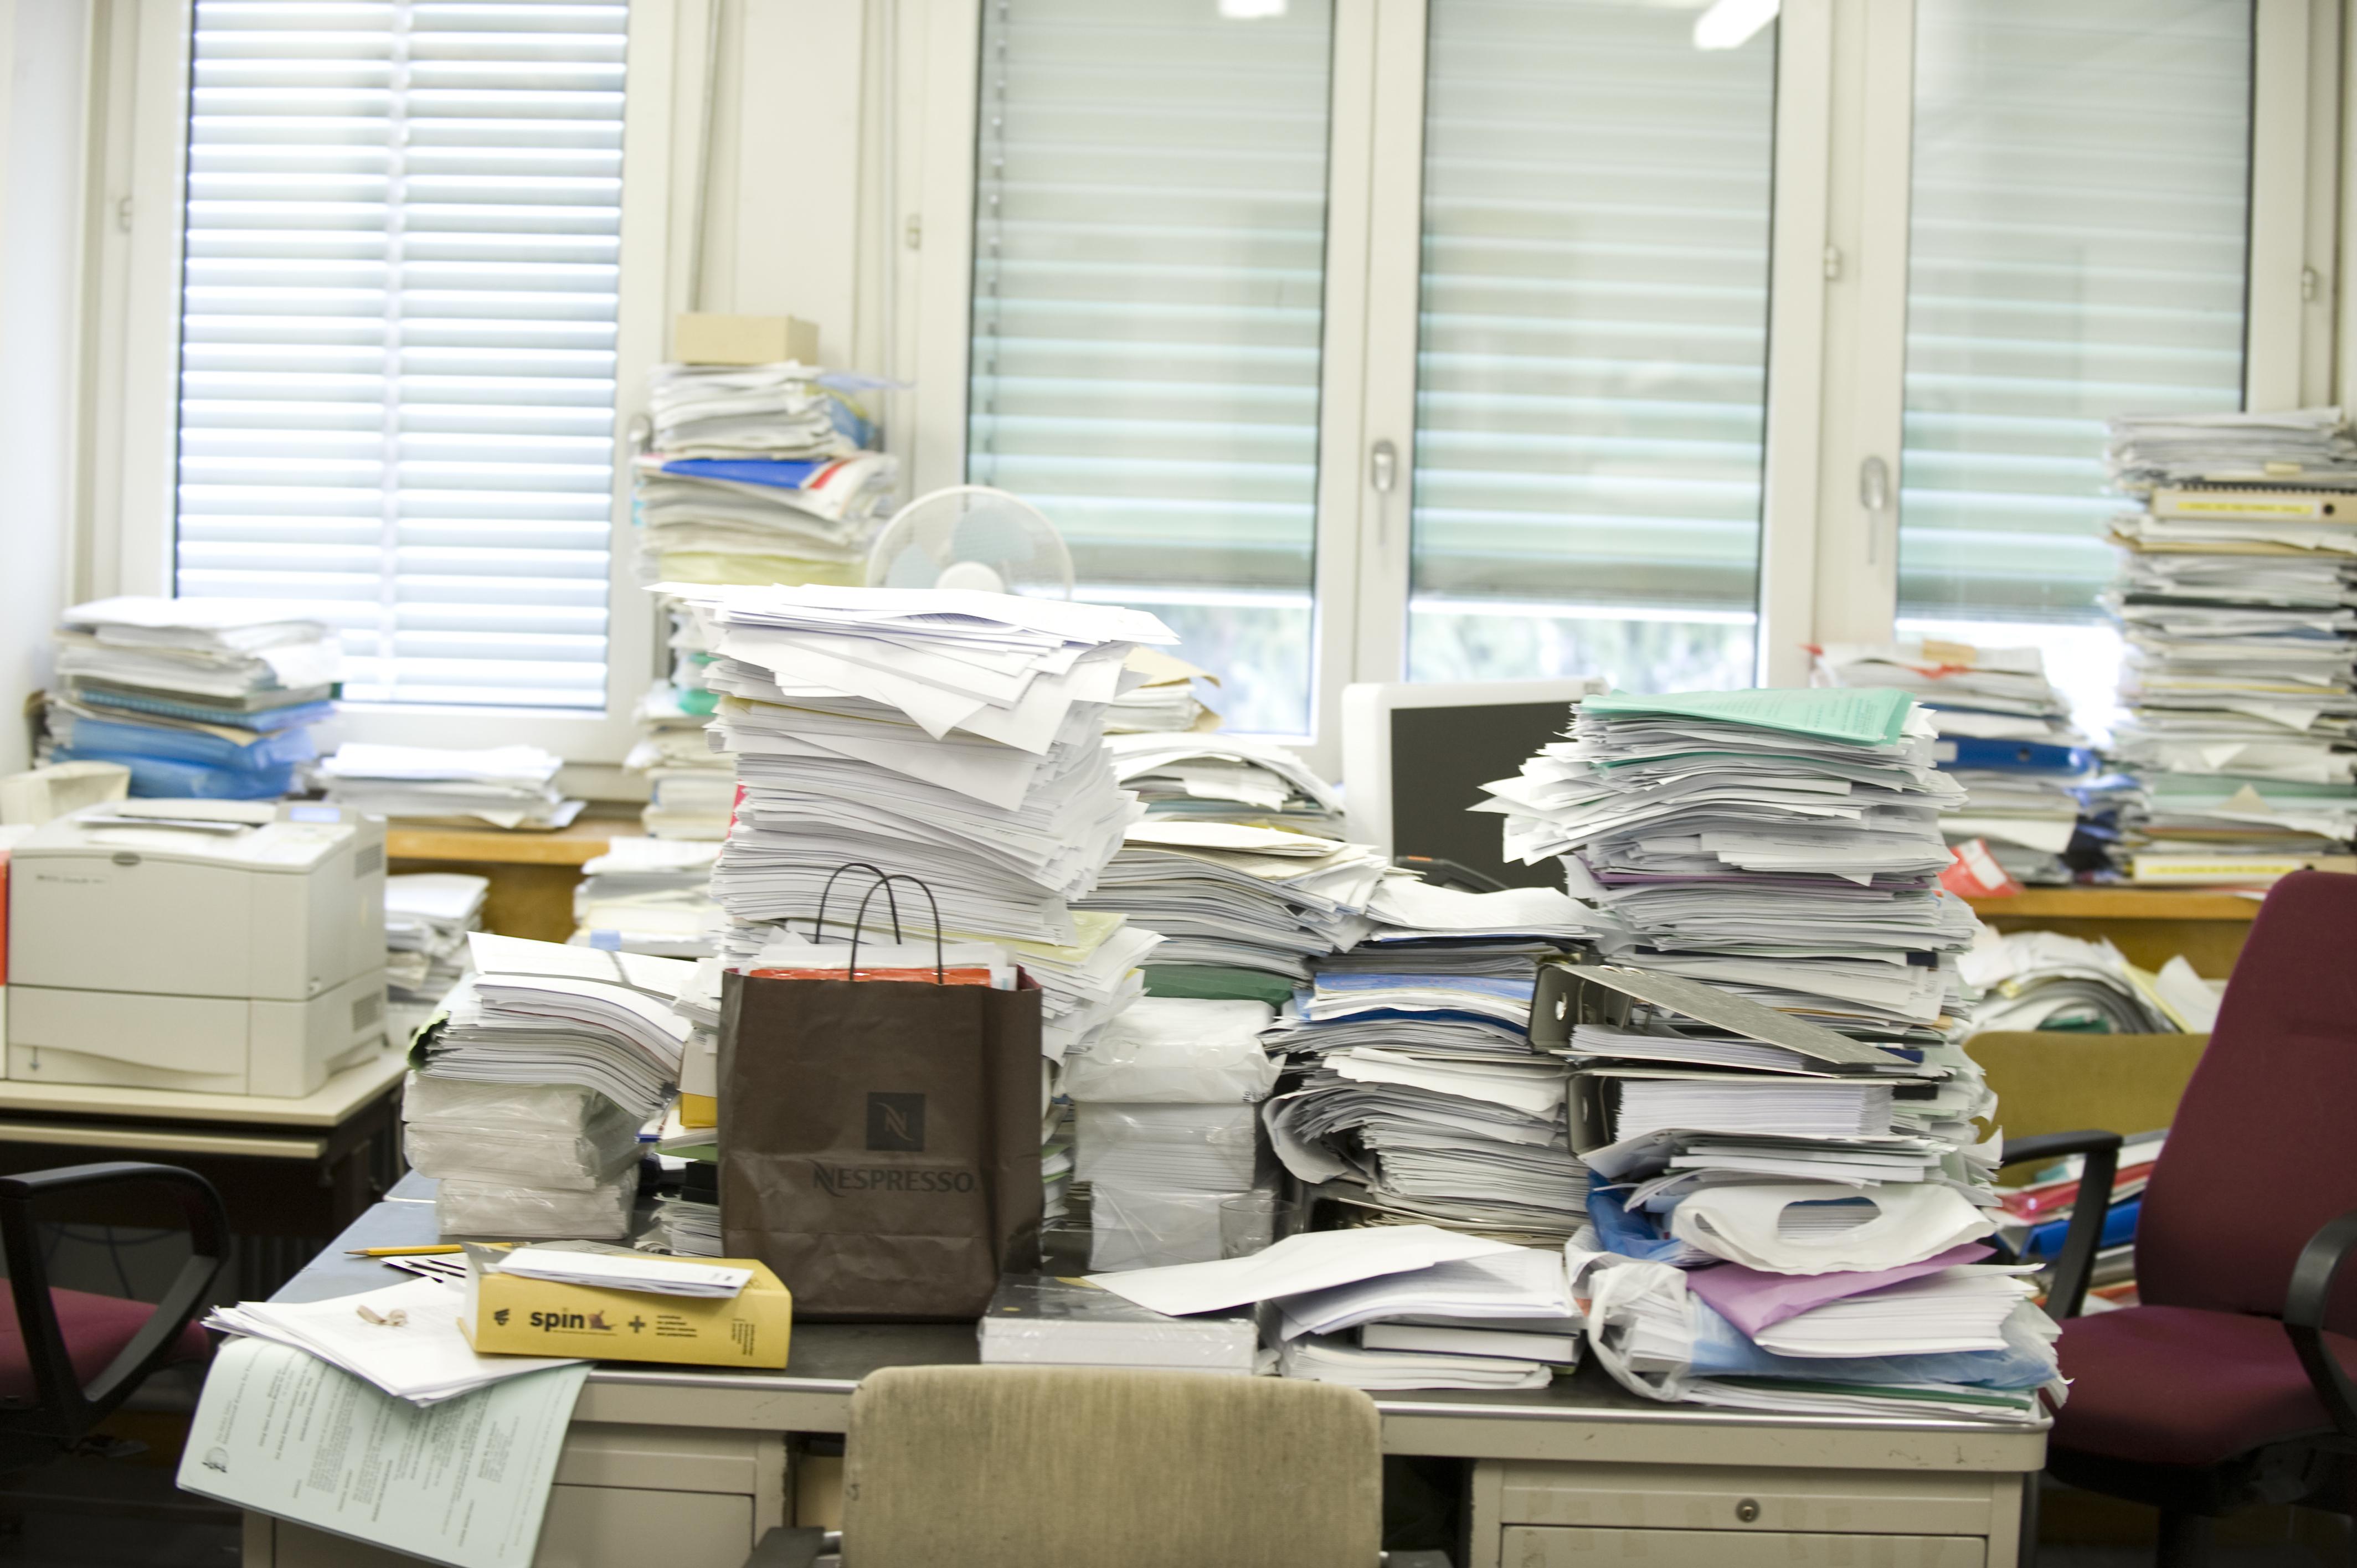 Messy desk with stacks of paperwork and binders, Cern, Geneva, Switzerland